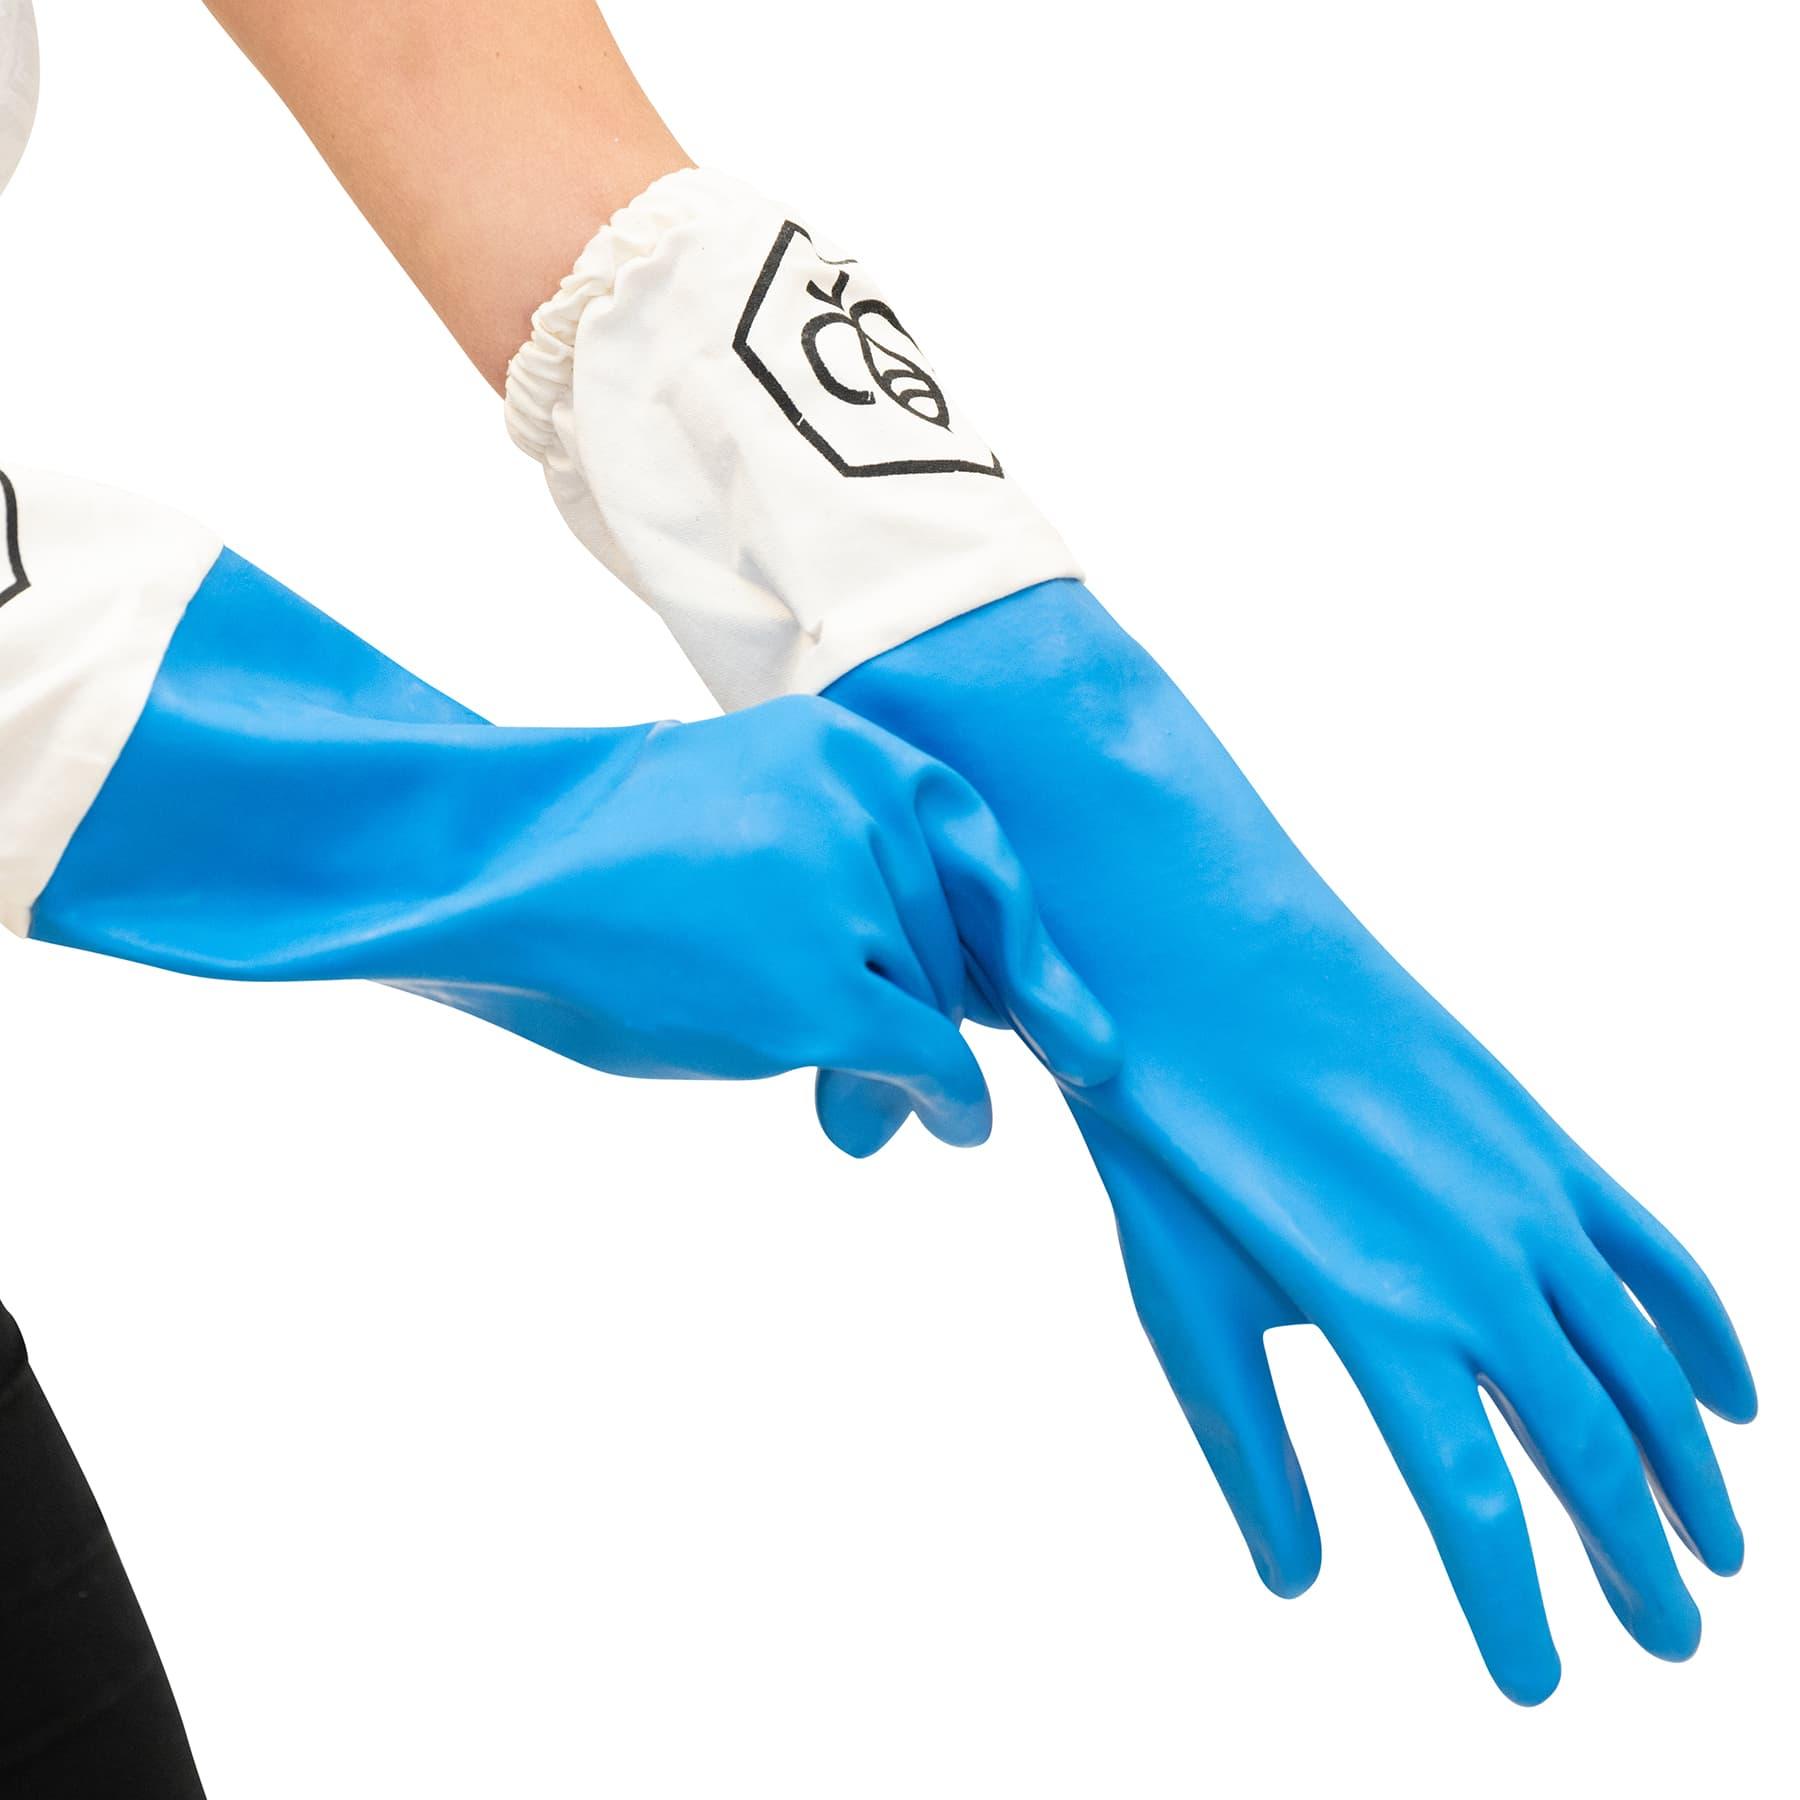 Gummihandschuhe hellblau mit Stulpe Gr. 9 (M)